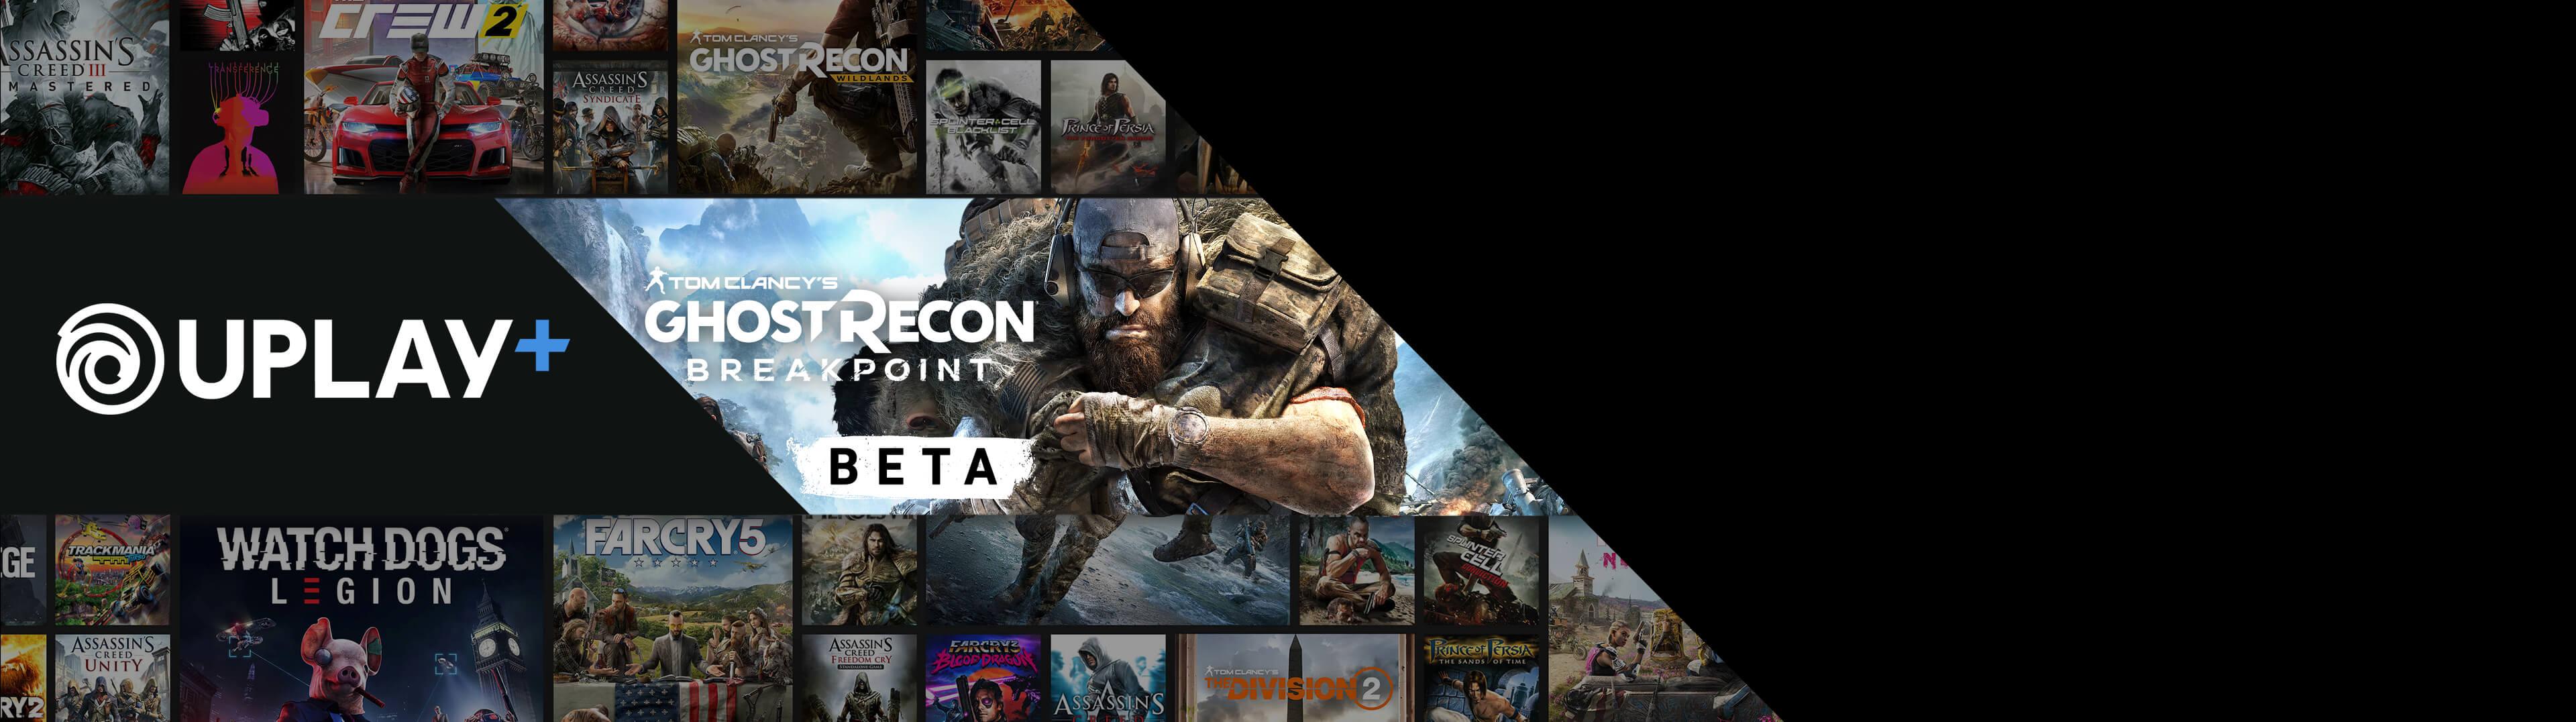 Ubisoft Store France - Site Officiel